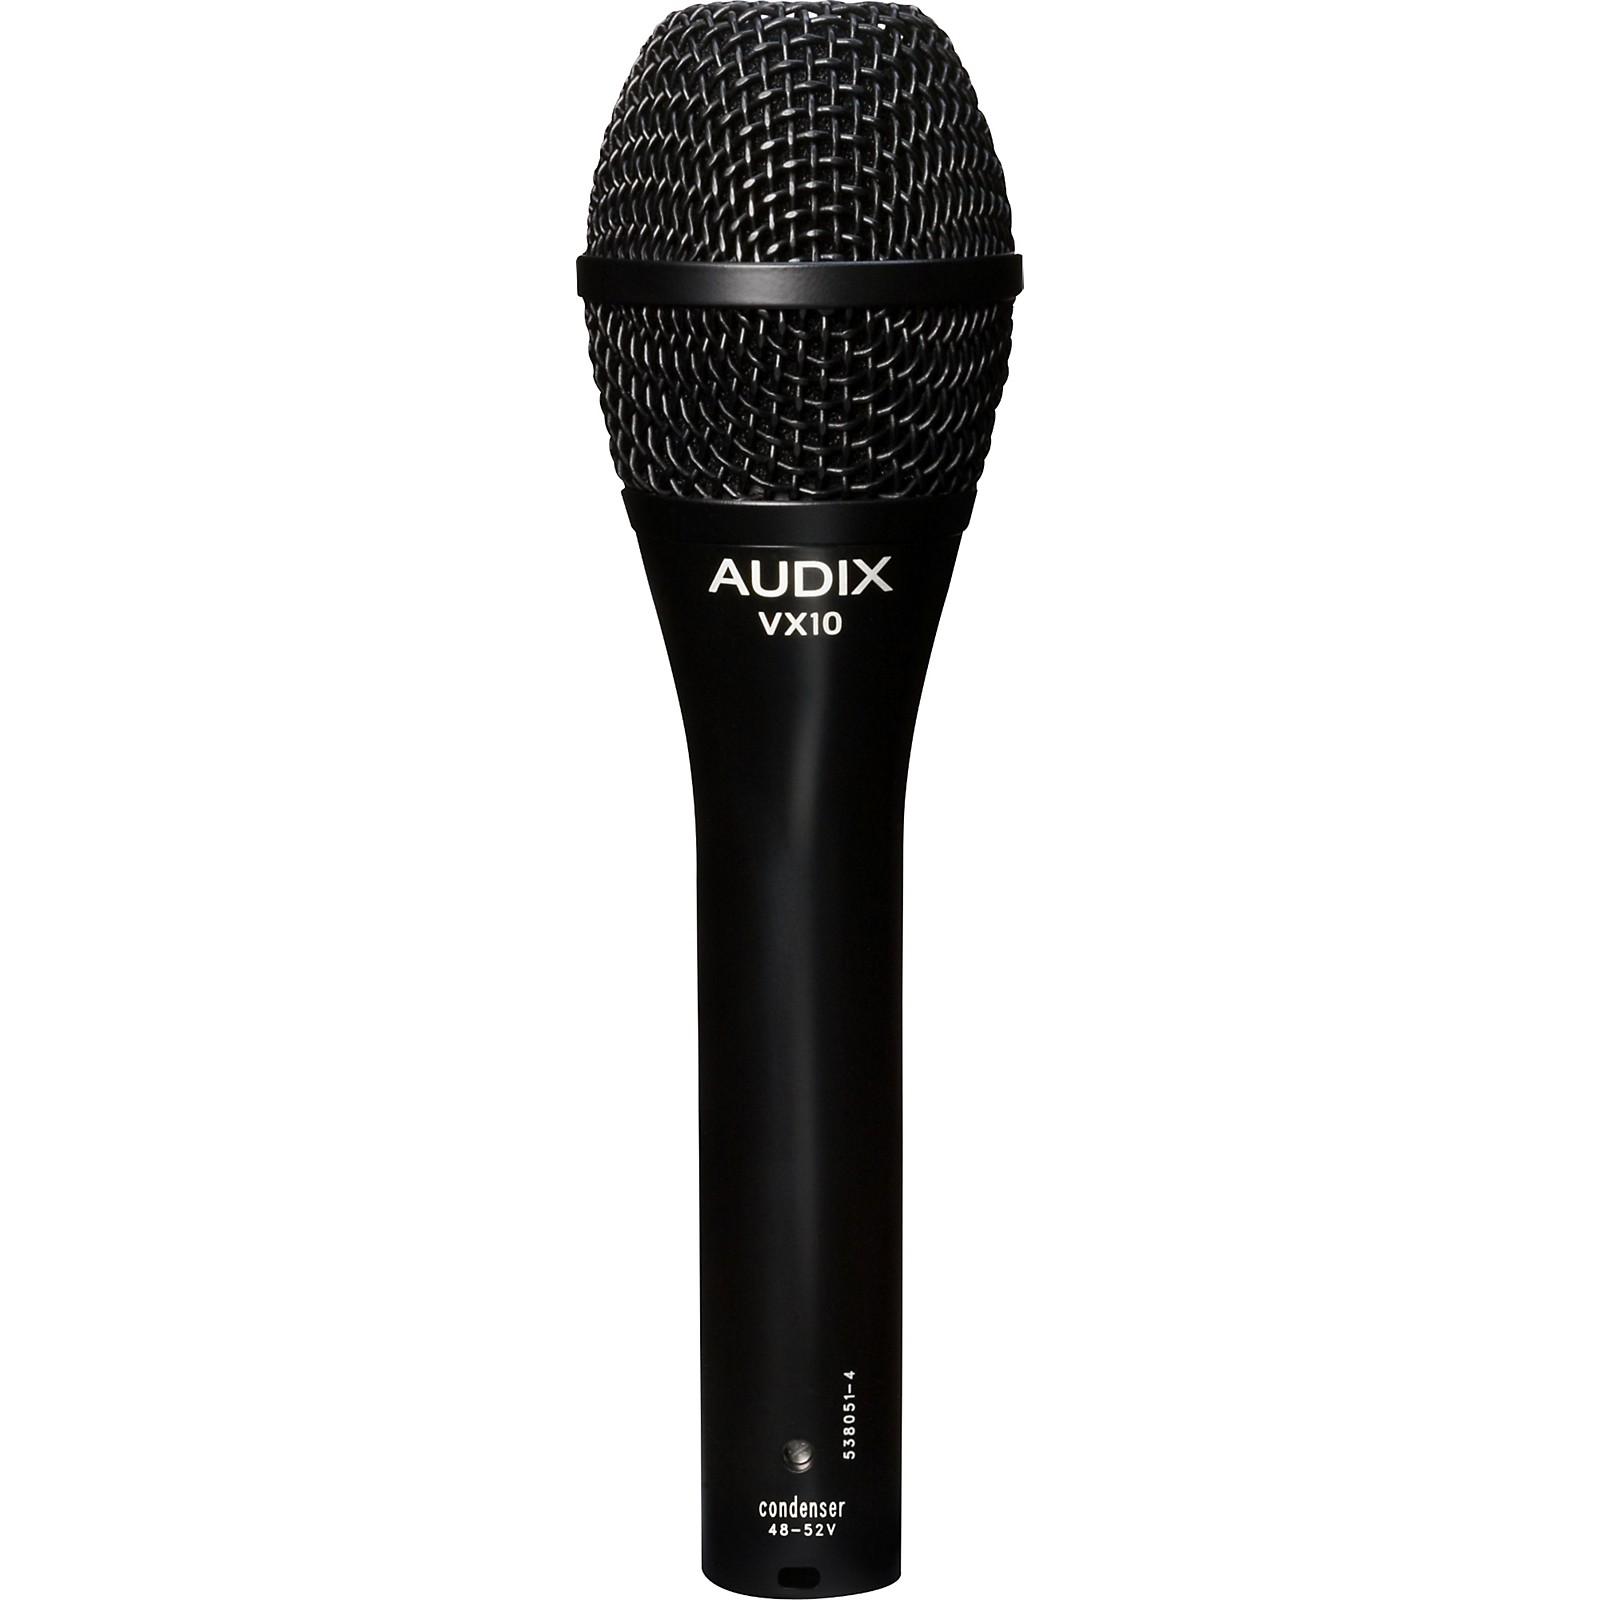 Audix VX10 Handheld Condenser Microphone